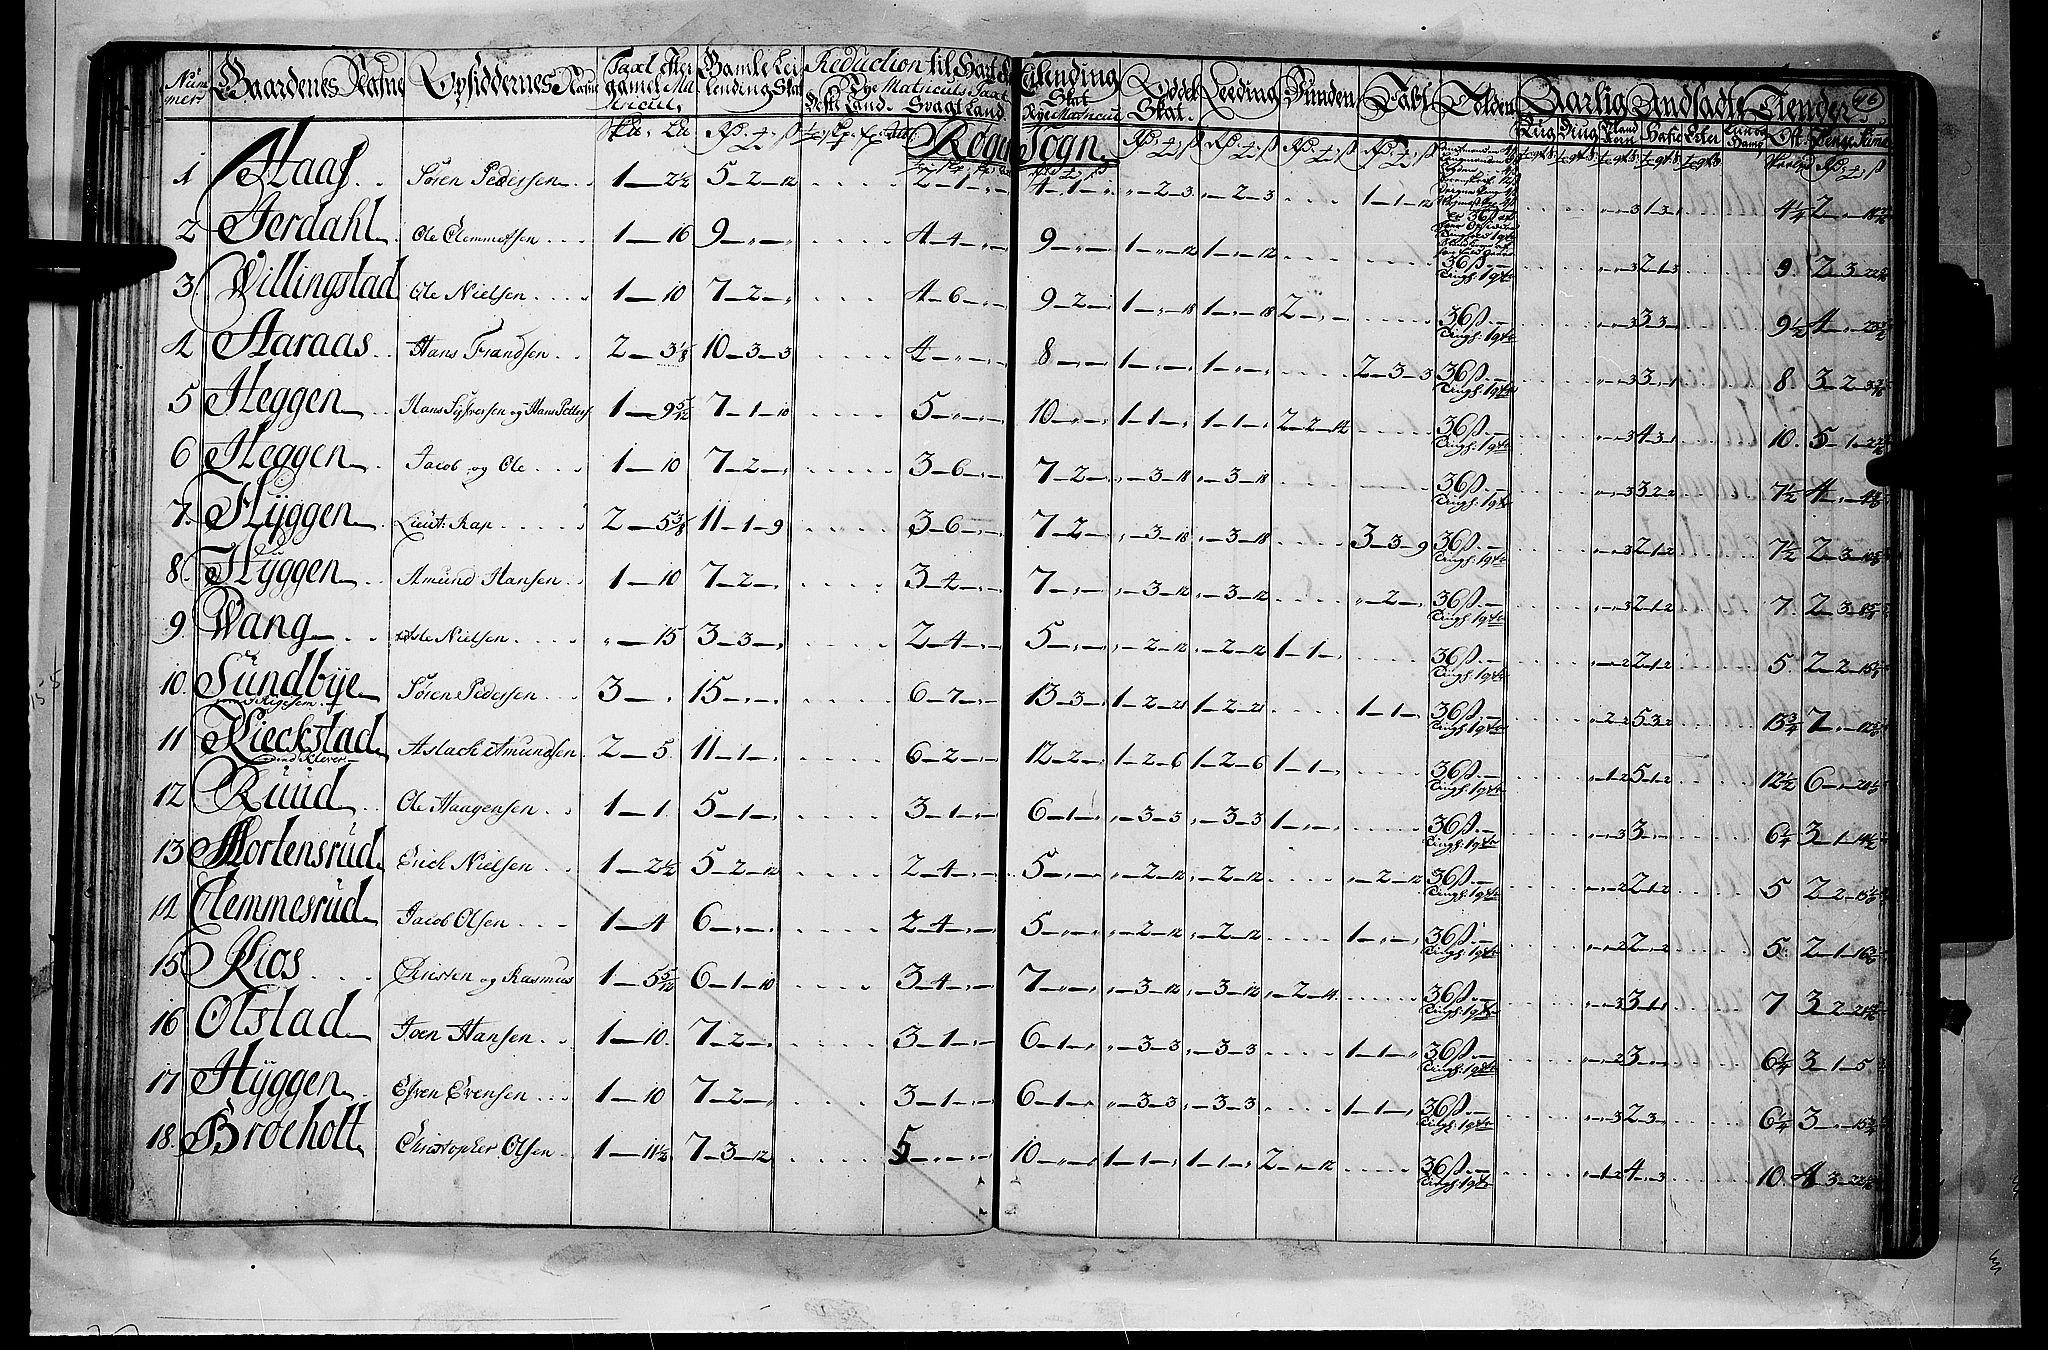 RA, Rentekammeret inntil 1814, Realistisk ordnet avdeling, N/Nb/Nbf/L0112: Buskerud matrikkelprotokoll, 1723, s. 48